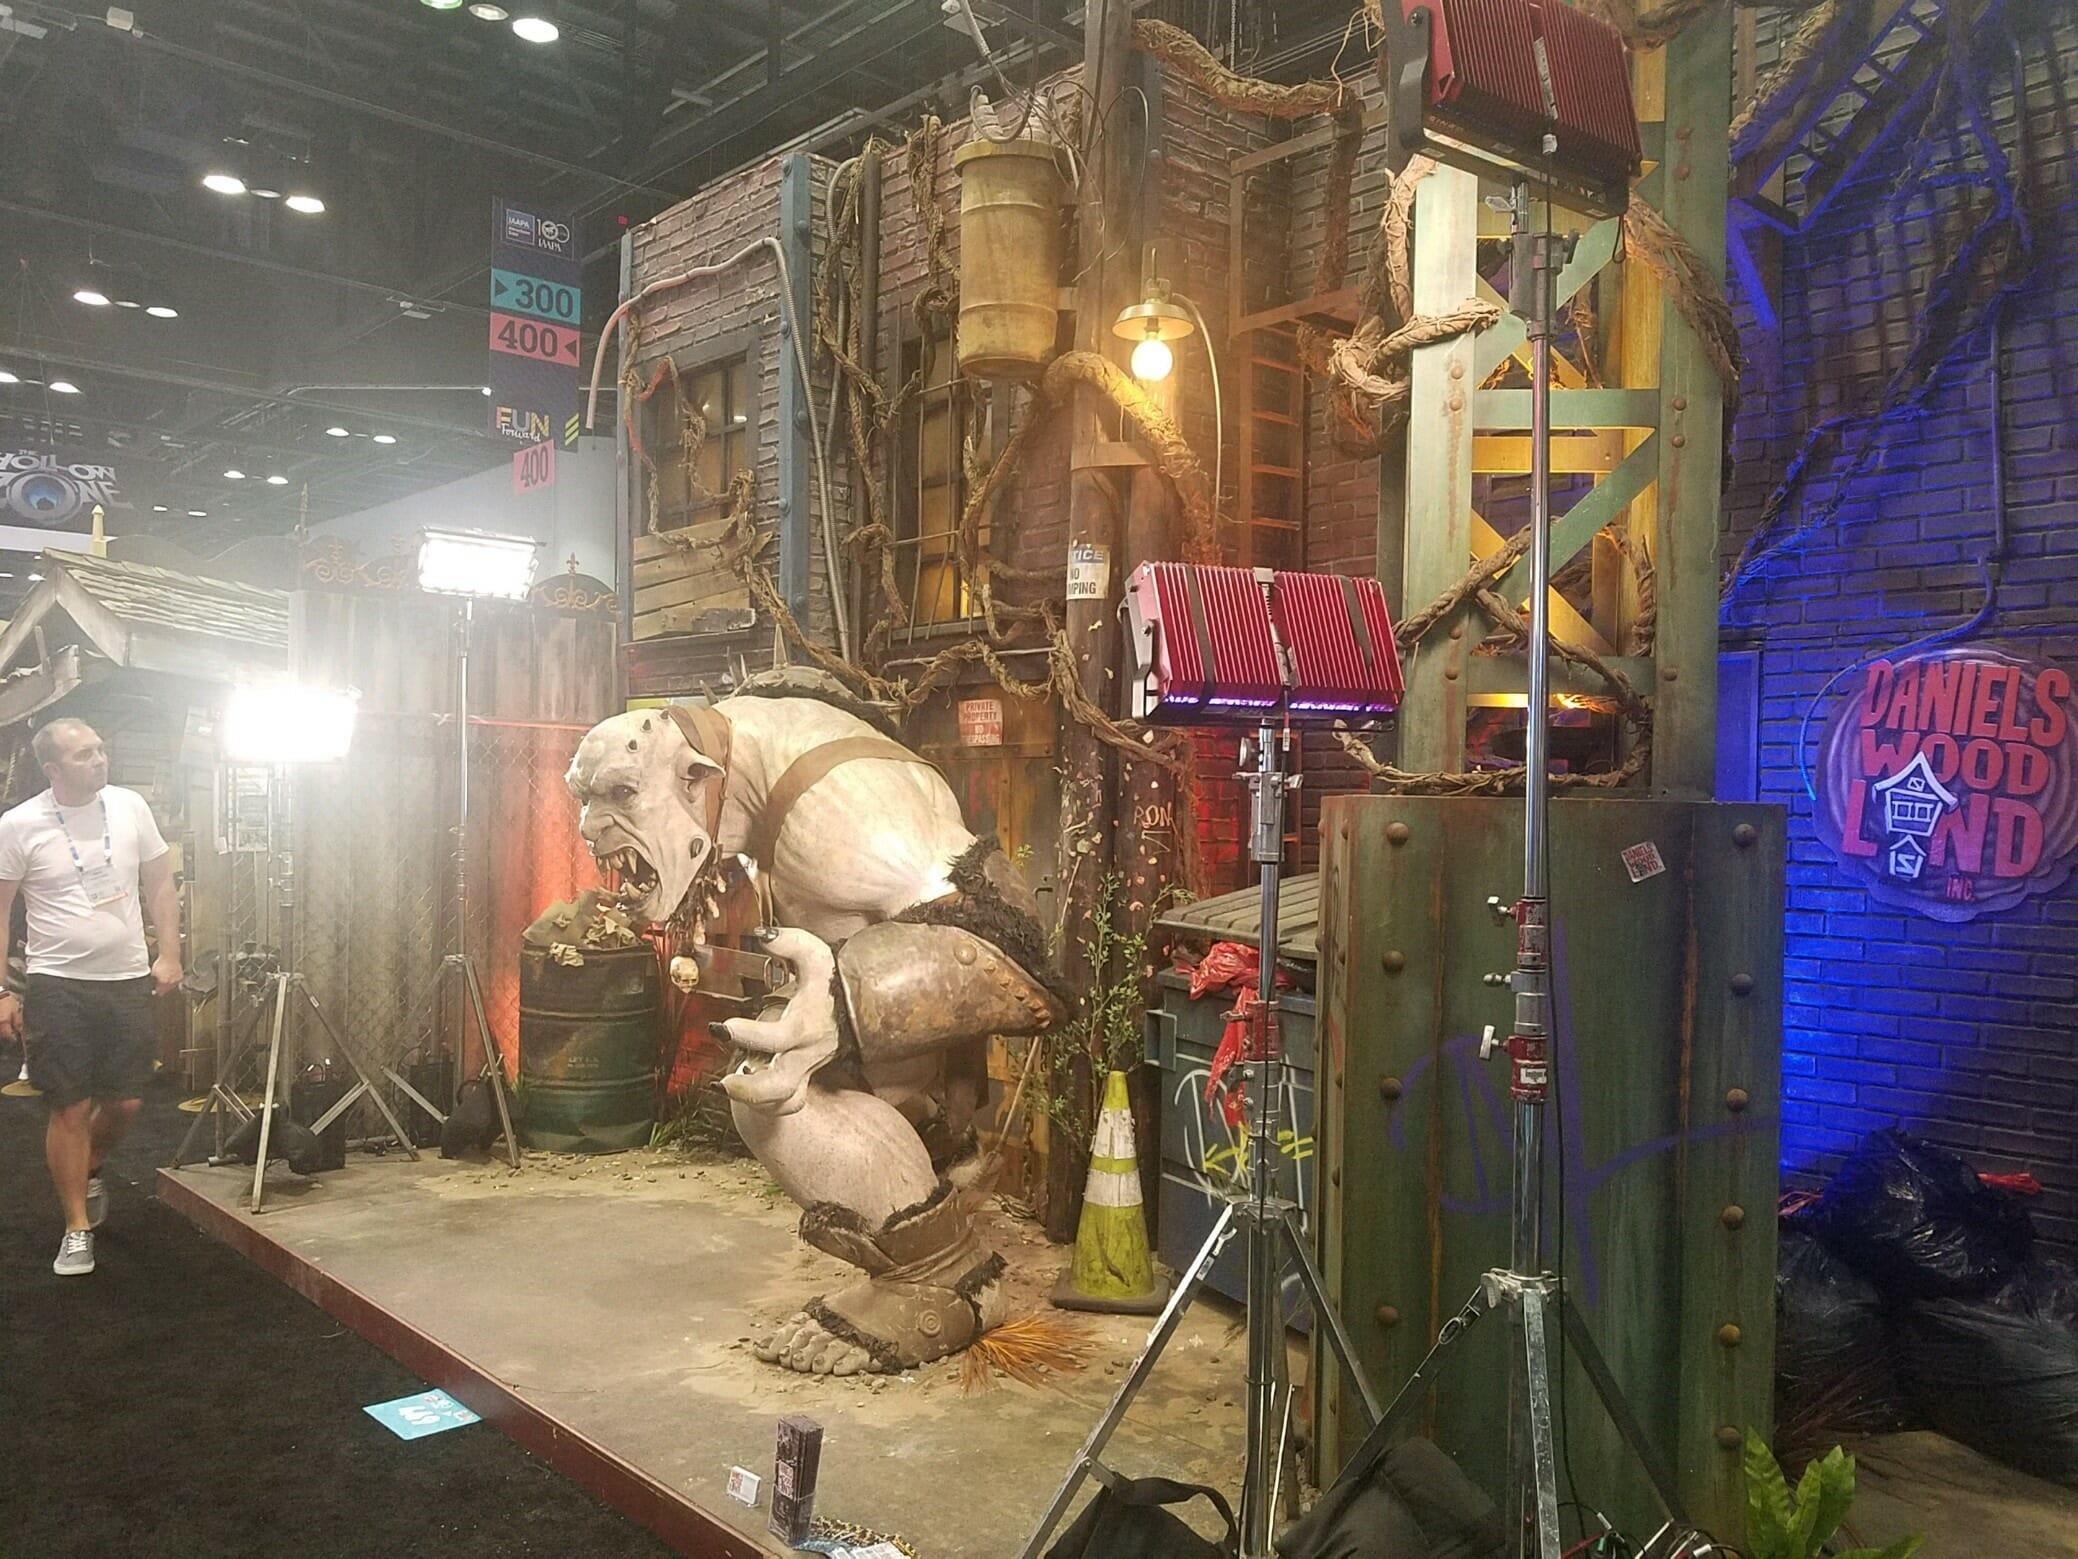 Daniels Wood Land Troll Ogre IAAPA 2018